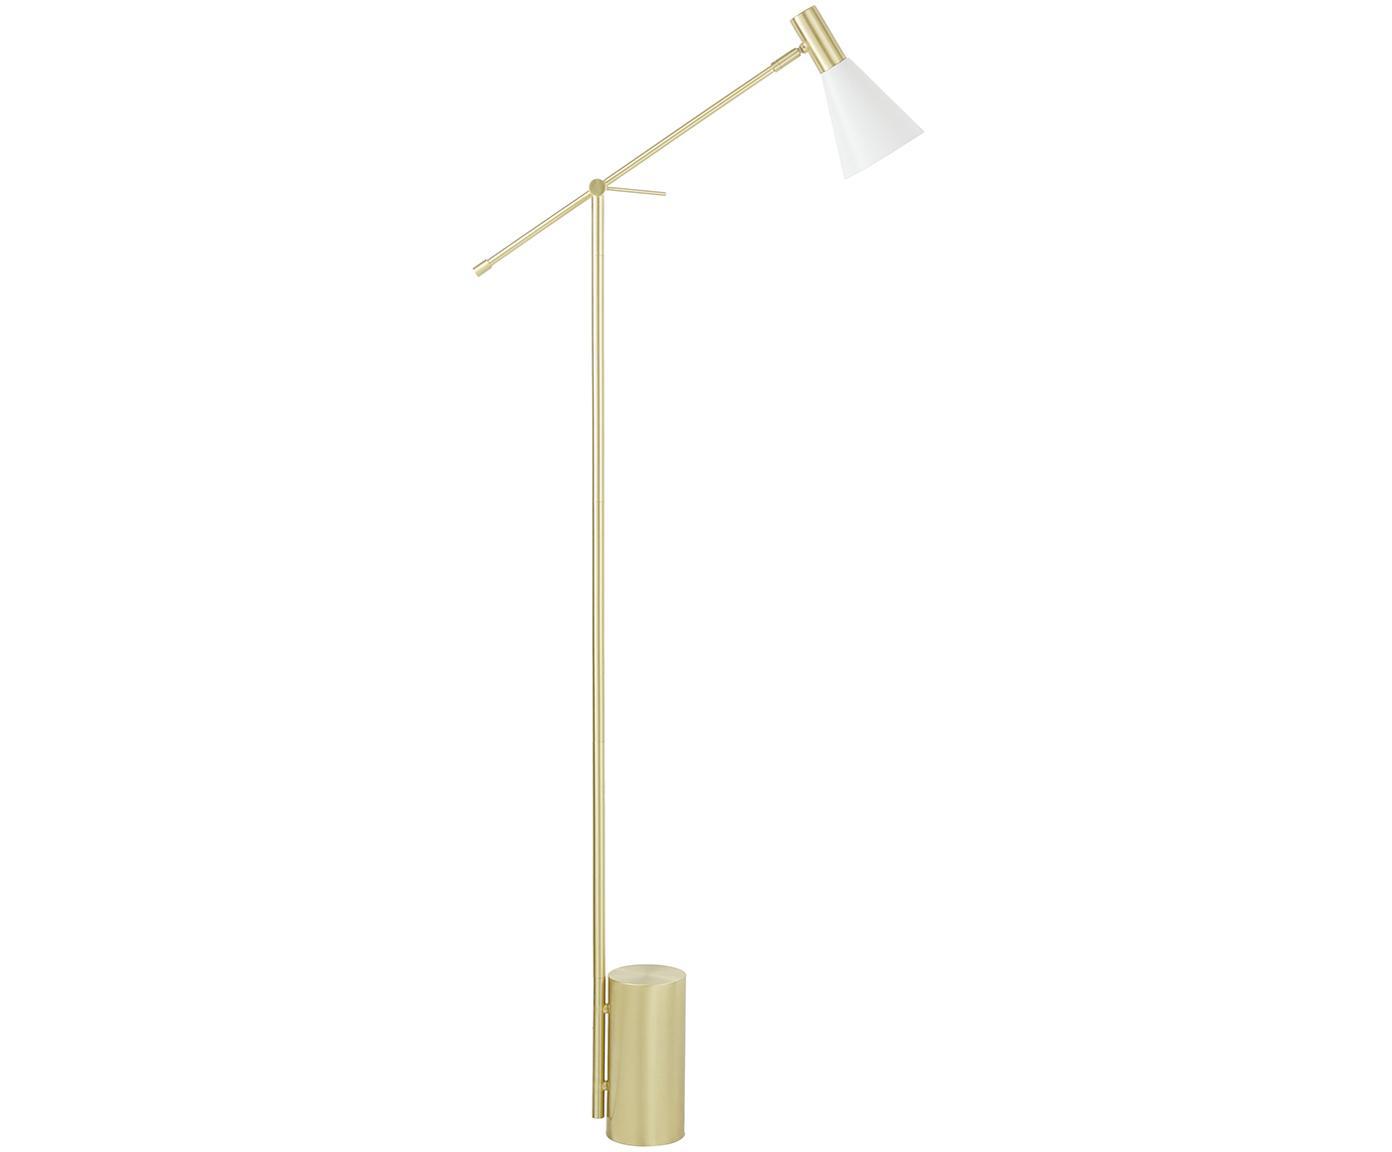 Stehlampe Sia, Lampenschirm: Metall, pulverbeschichtet, Weiss, Messingfarben, Ø 14 x H 162 cm